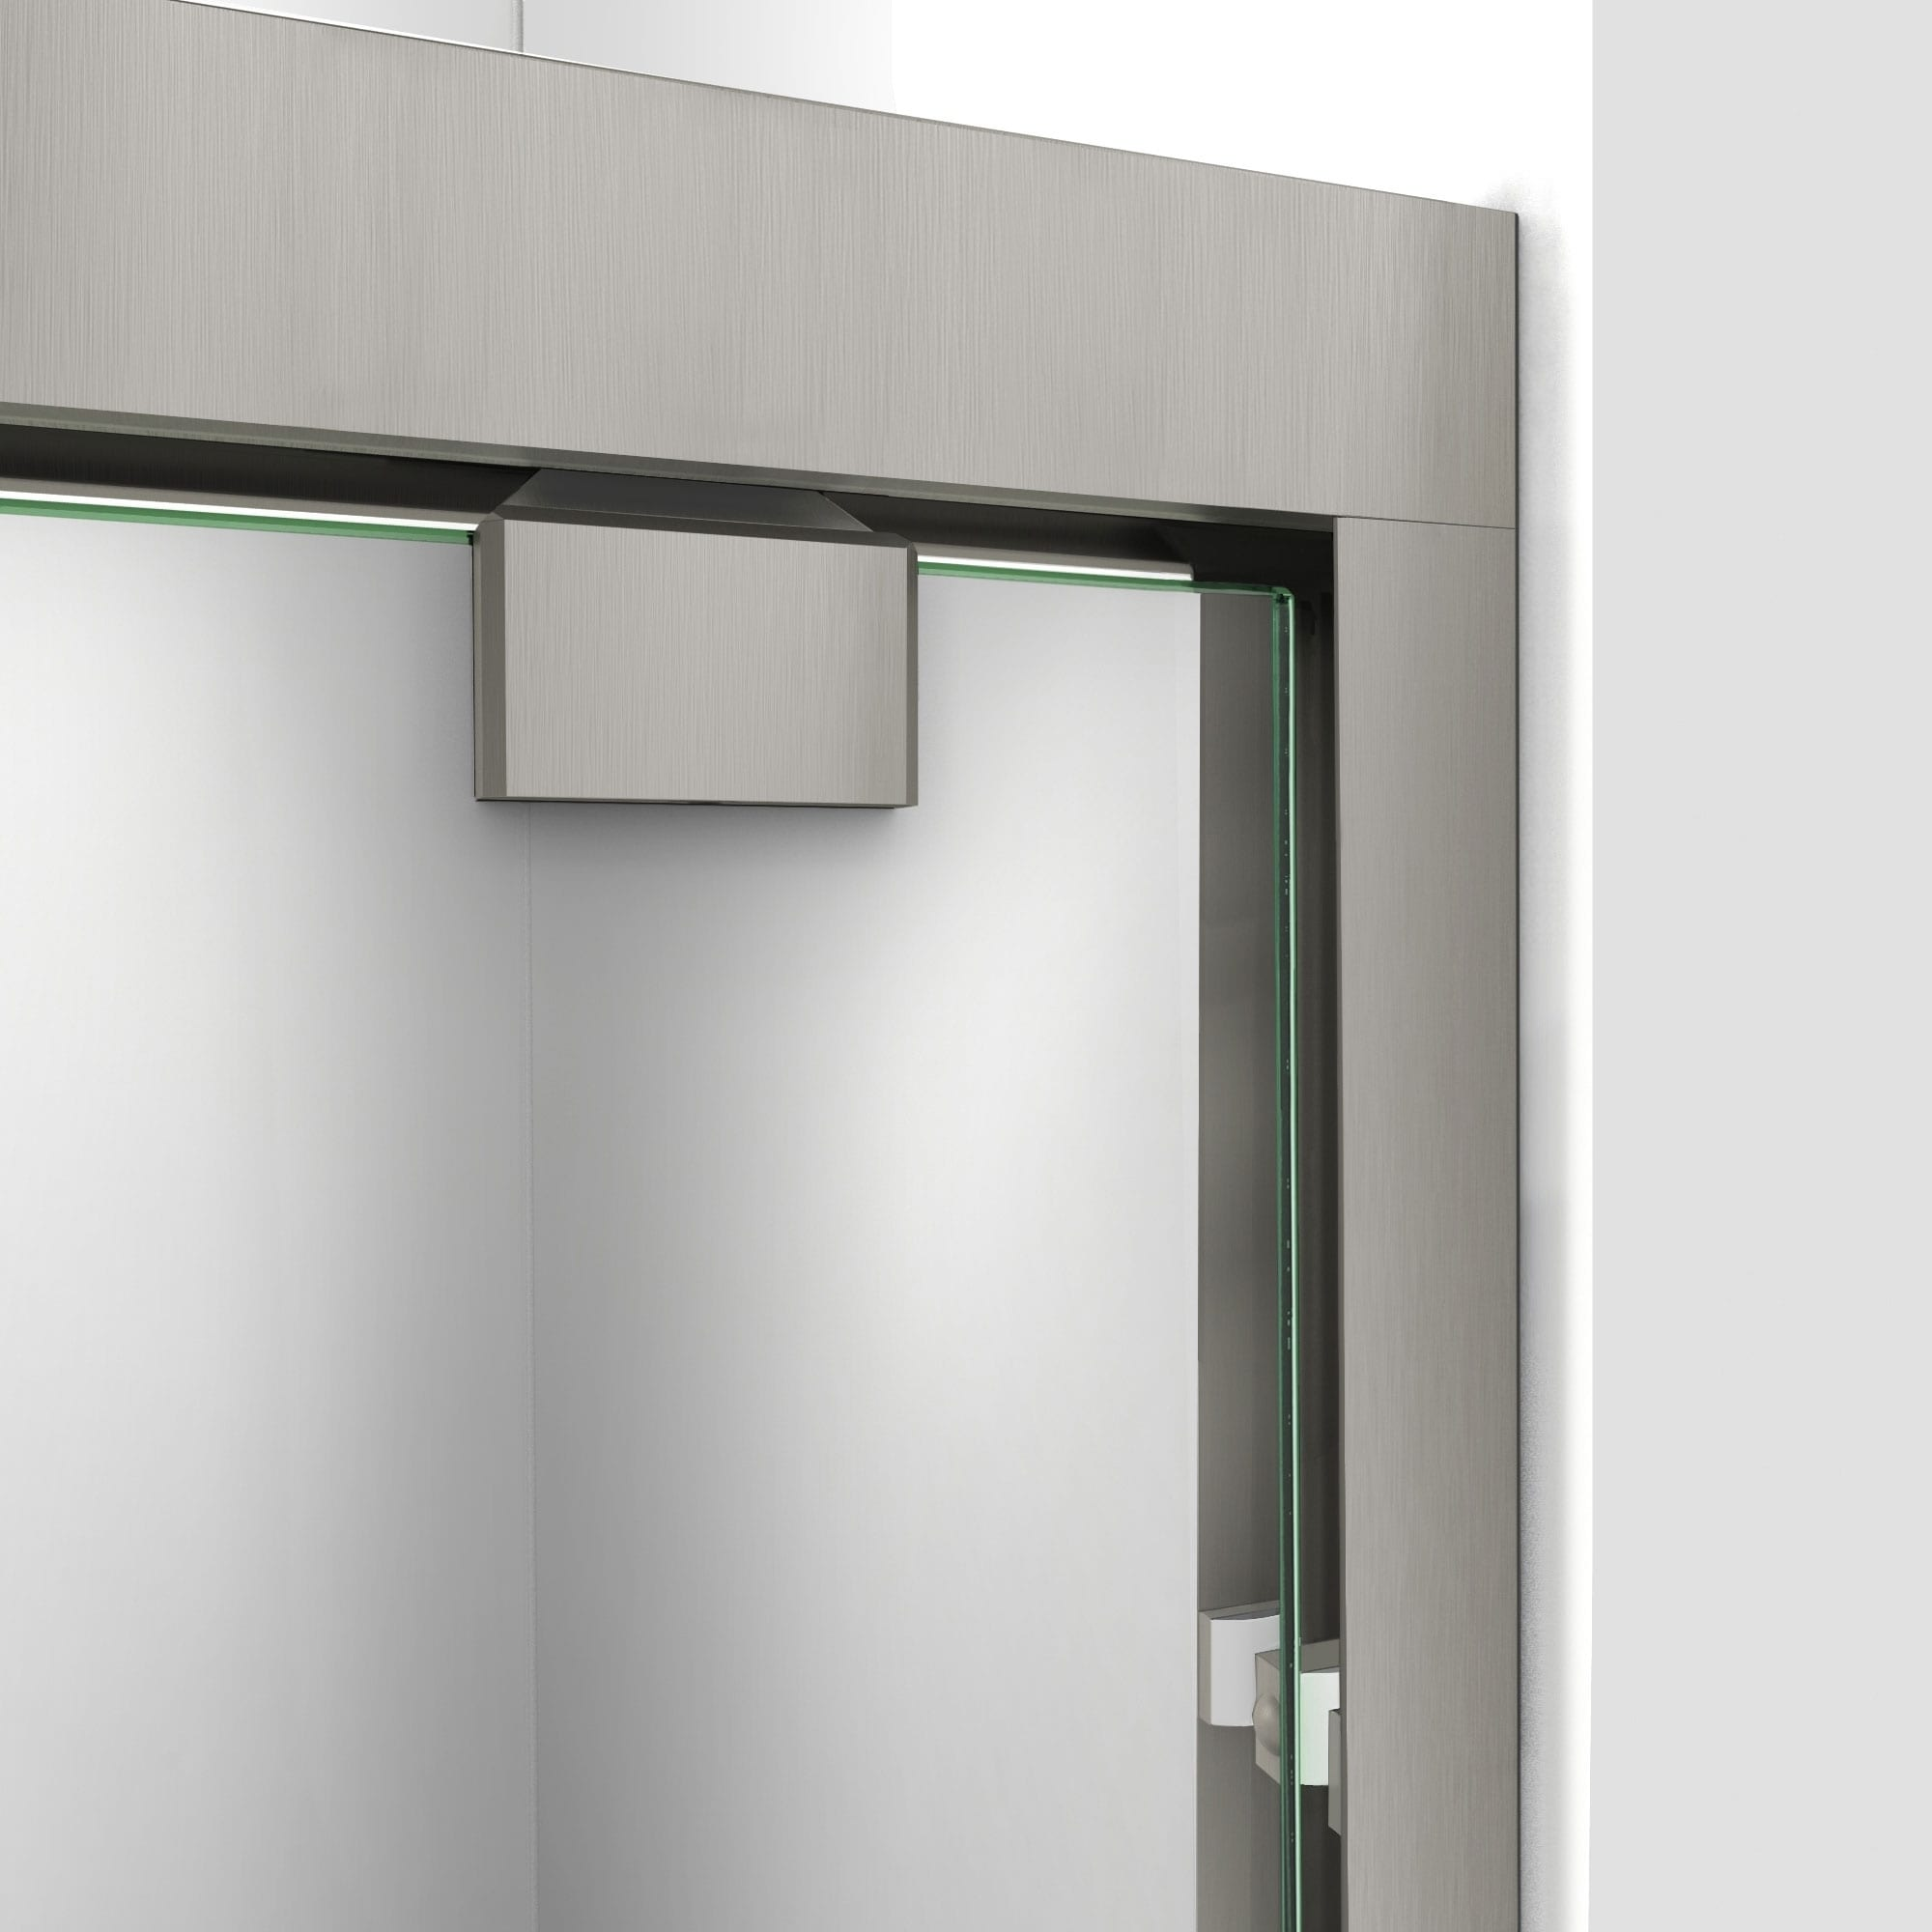 Dreamline Encore 50 54 In W X 76 In H Semi Frameless Bypass Sliding Shower Door 50 54 W